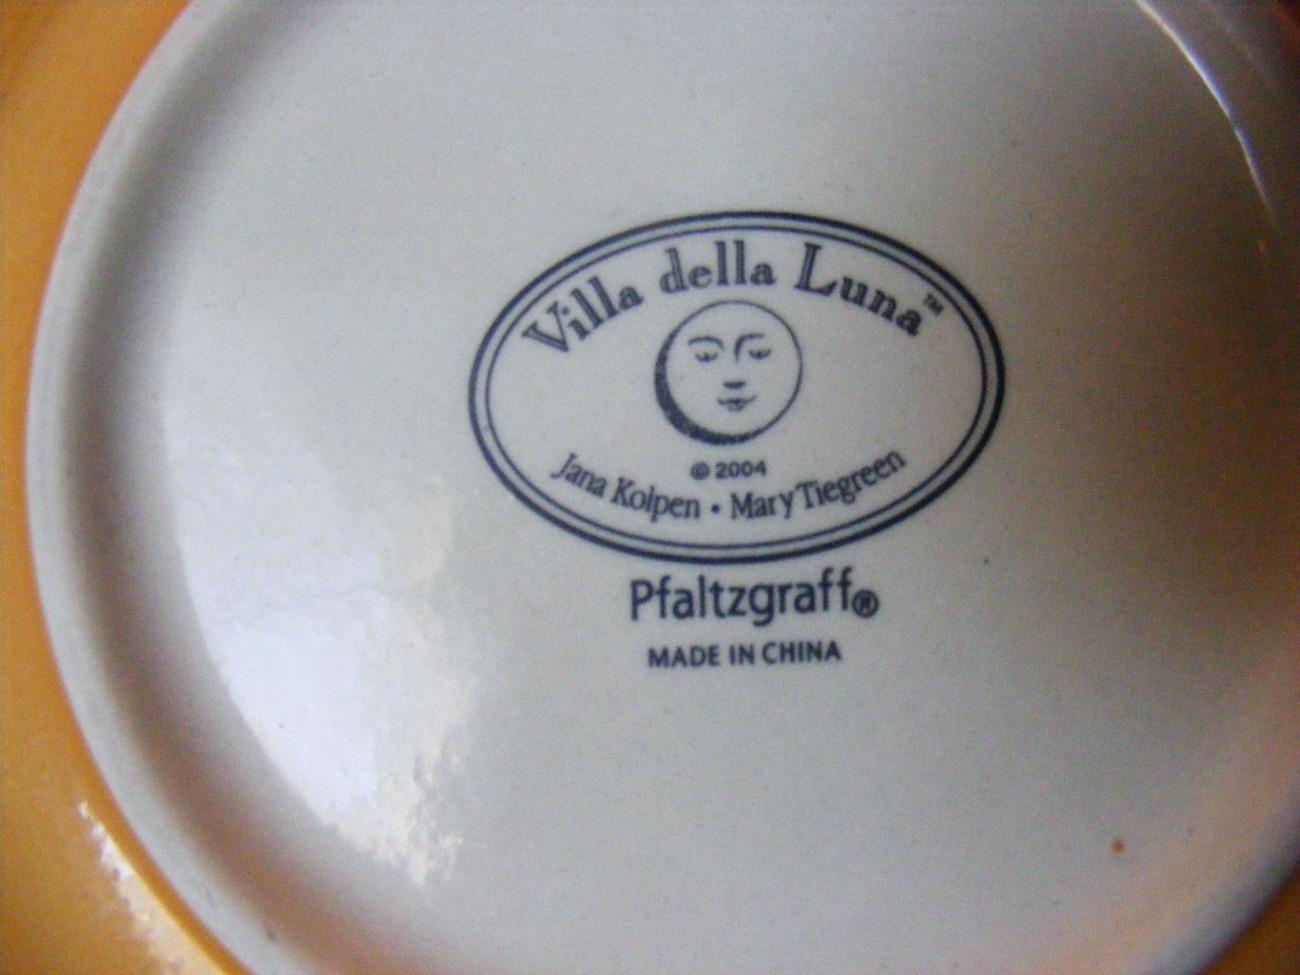 Pfaltzgraff Villa Della Luna Appetizer Plates - Set of 2